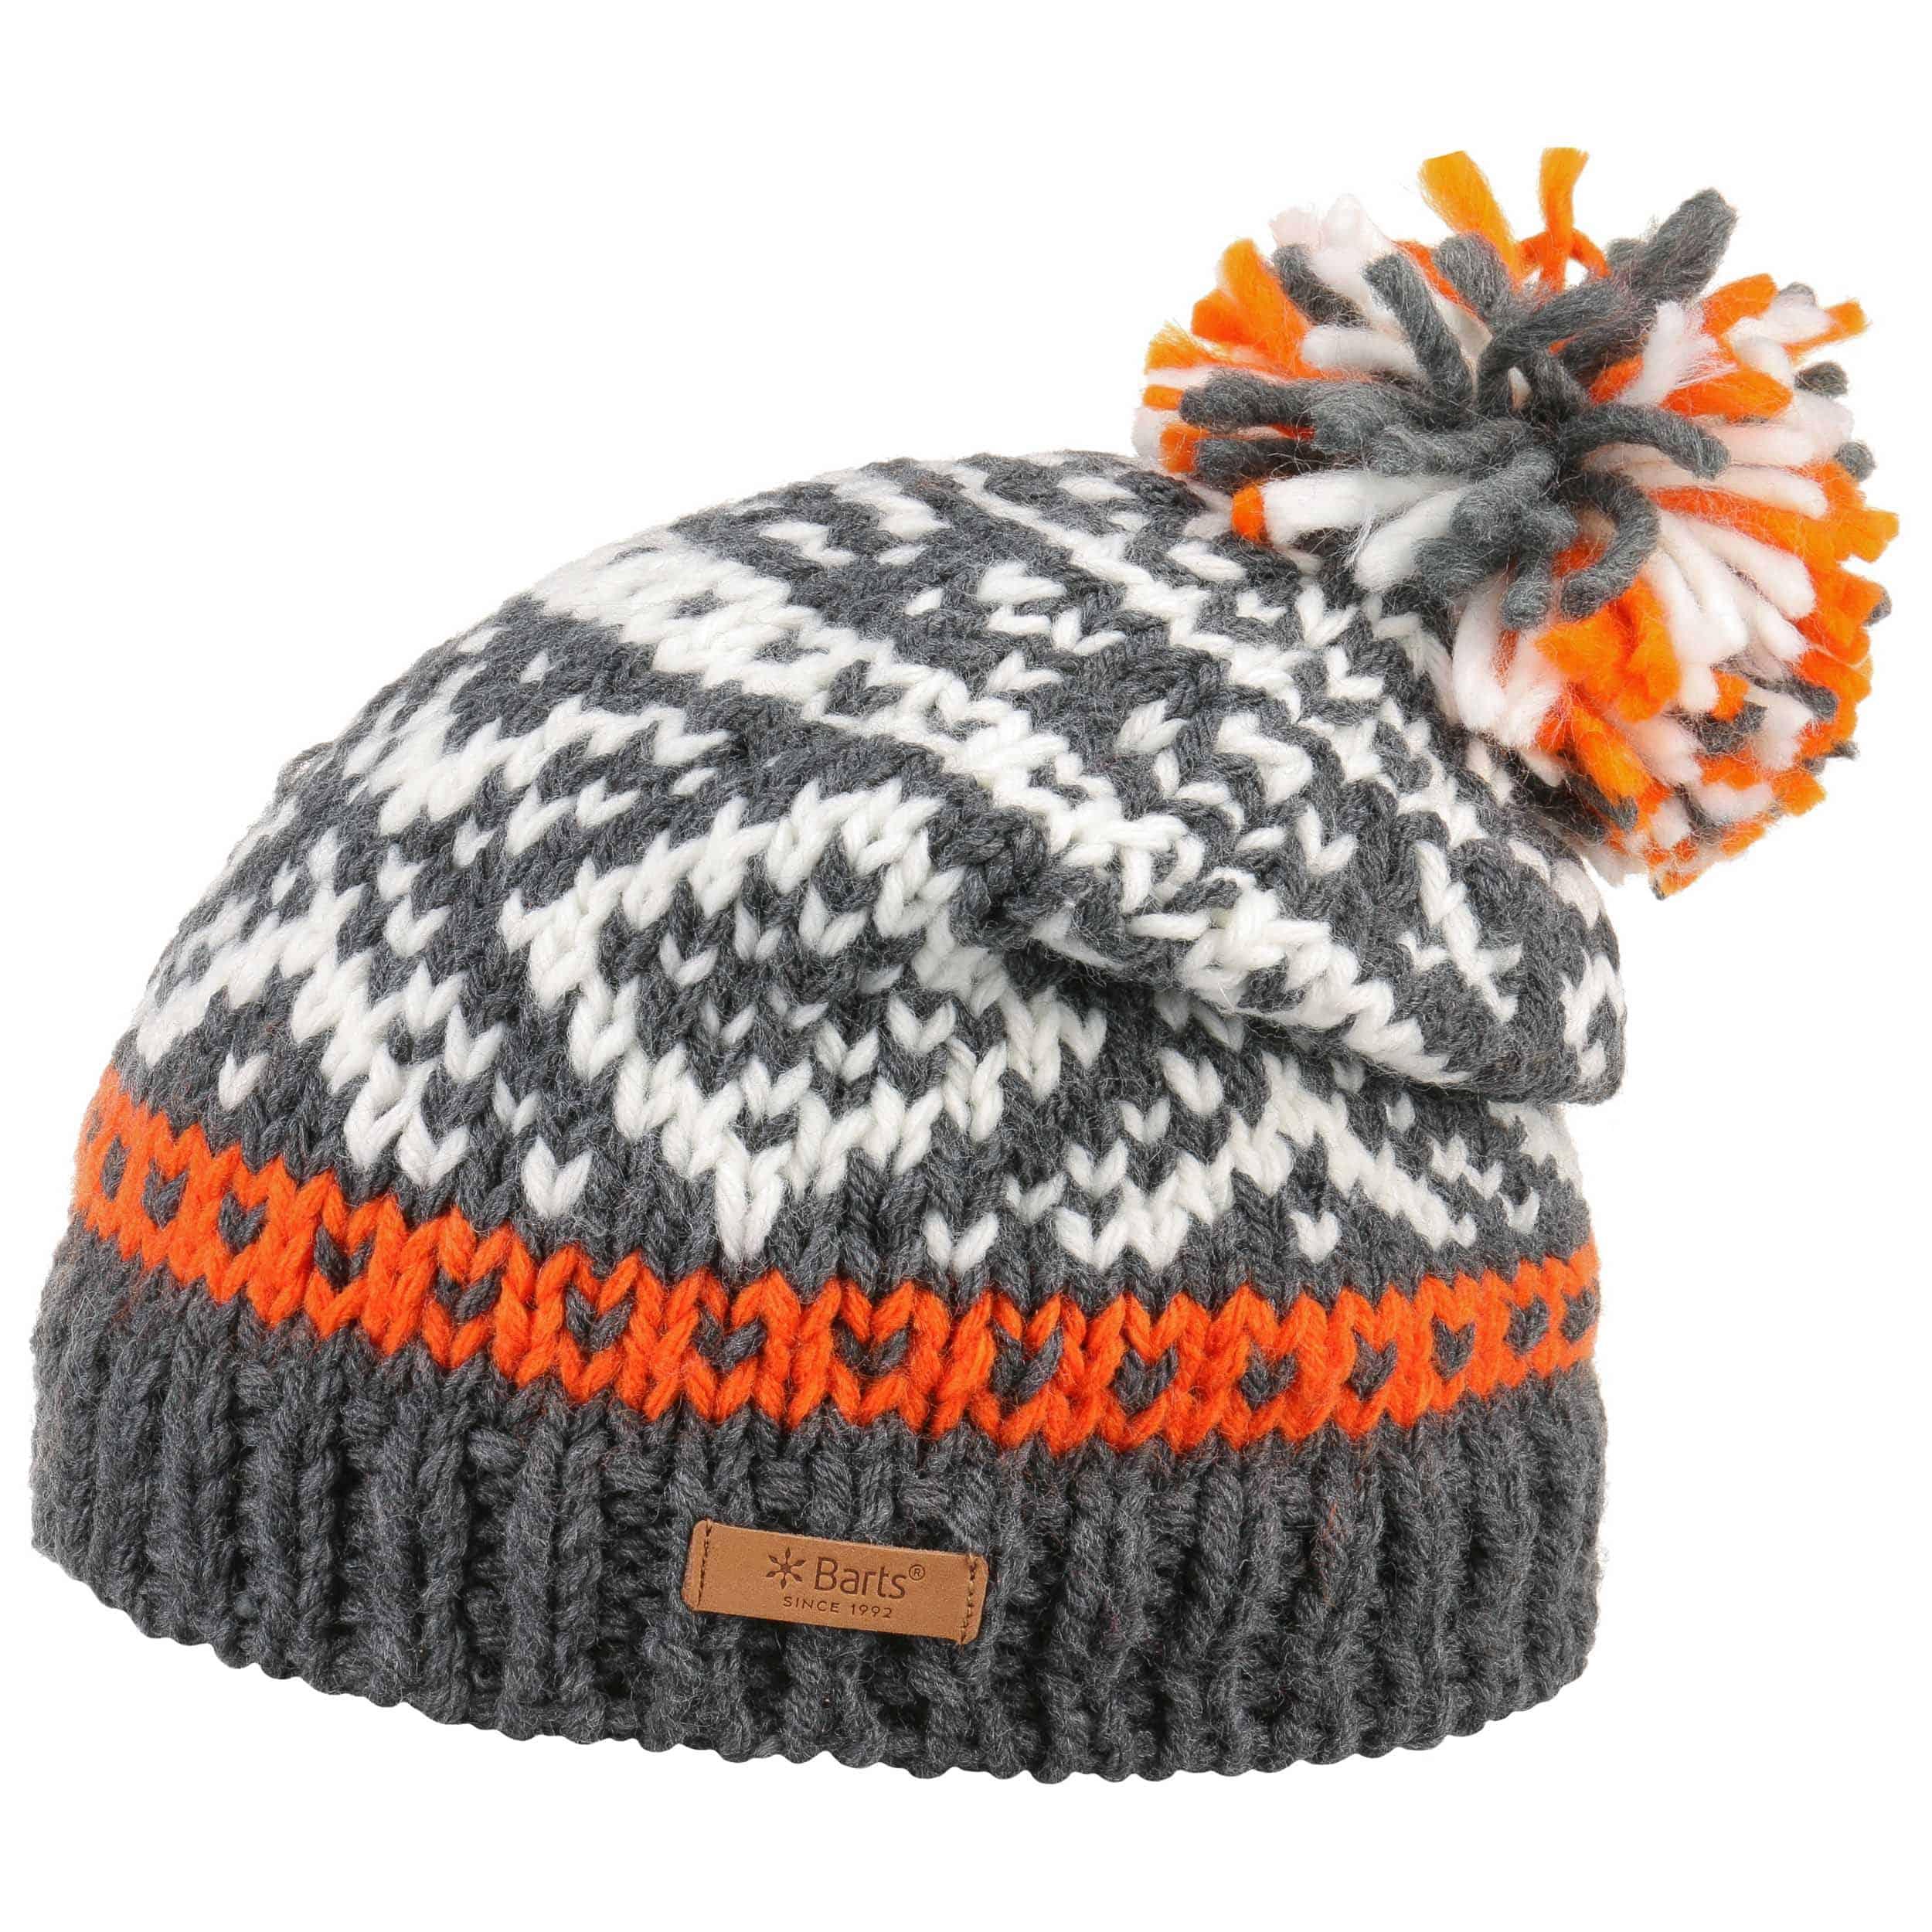 3fb99c235e9 ... Log Cabin Pompom Hat by Barts - blue 1 ...